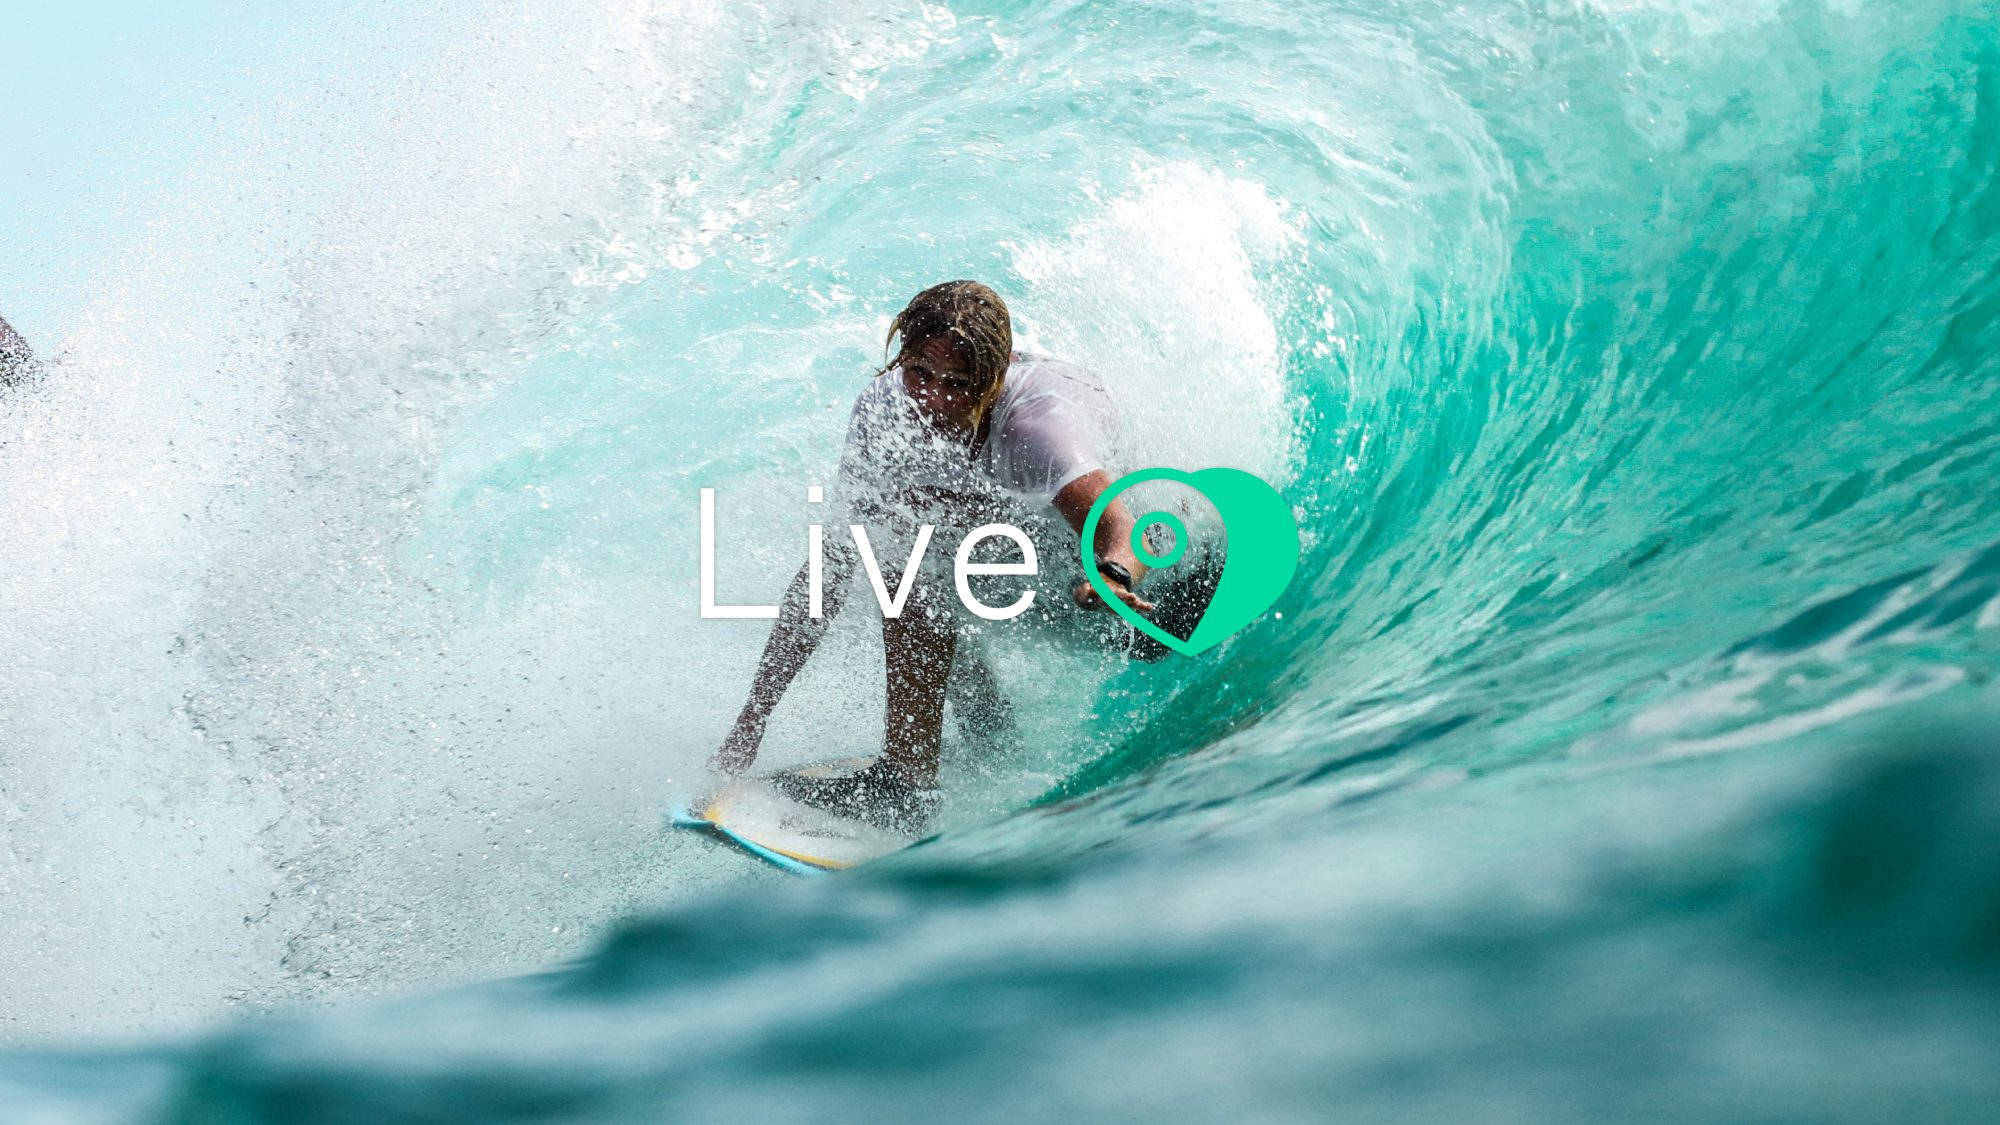 Live_blake